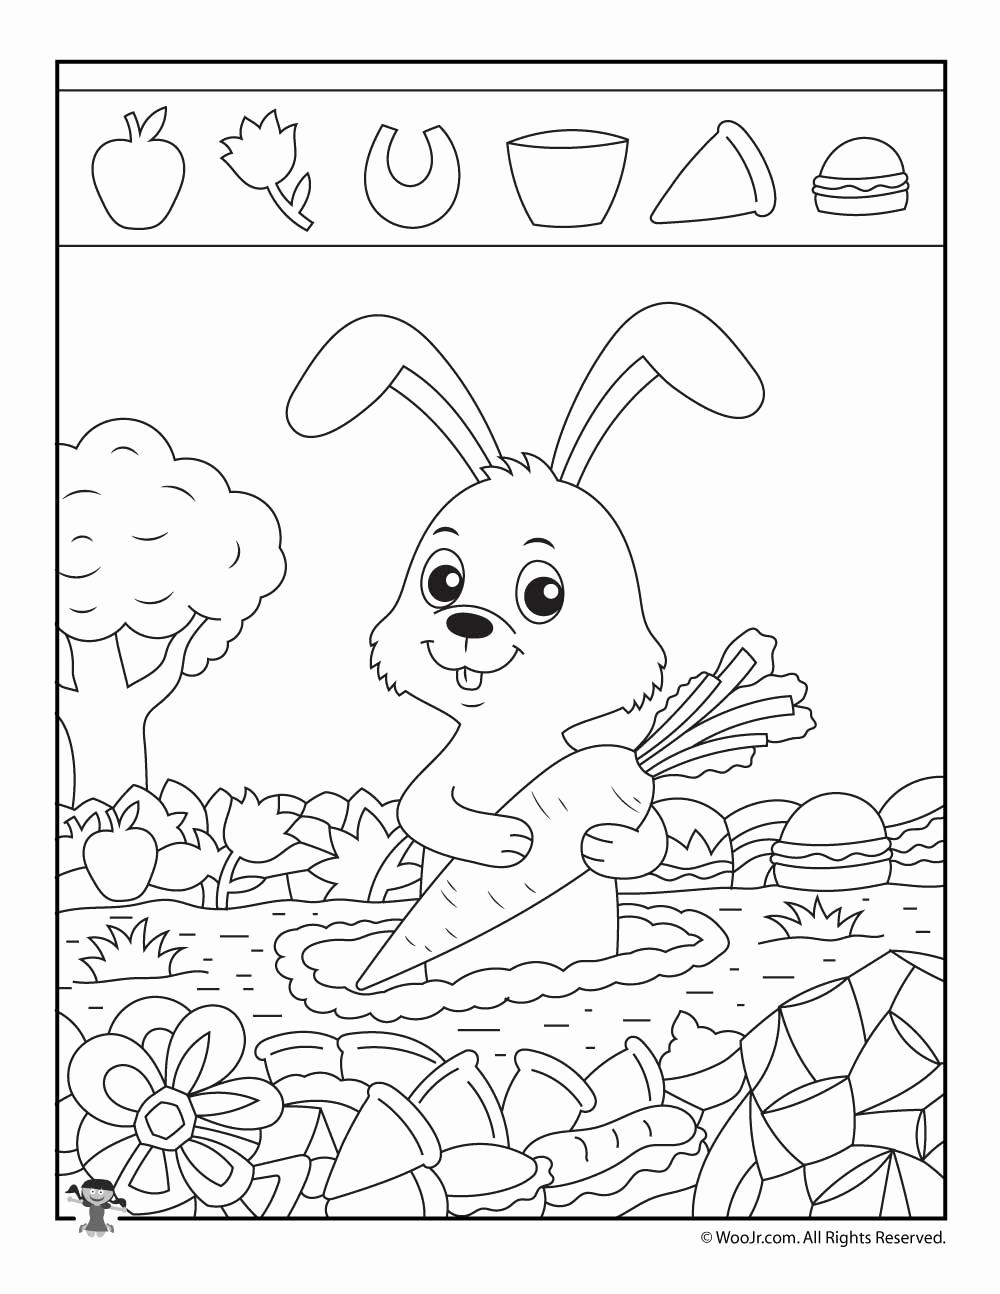 Hidden Animal Pictures Worksheets Unique Rabbit Hidden Picture Puzzle